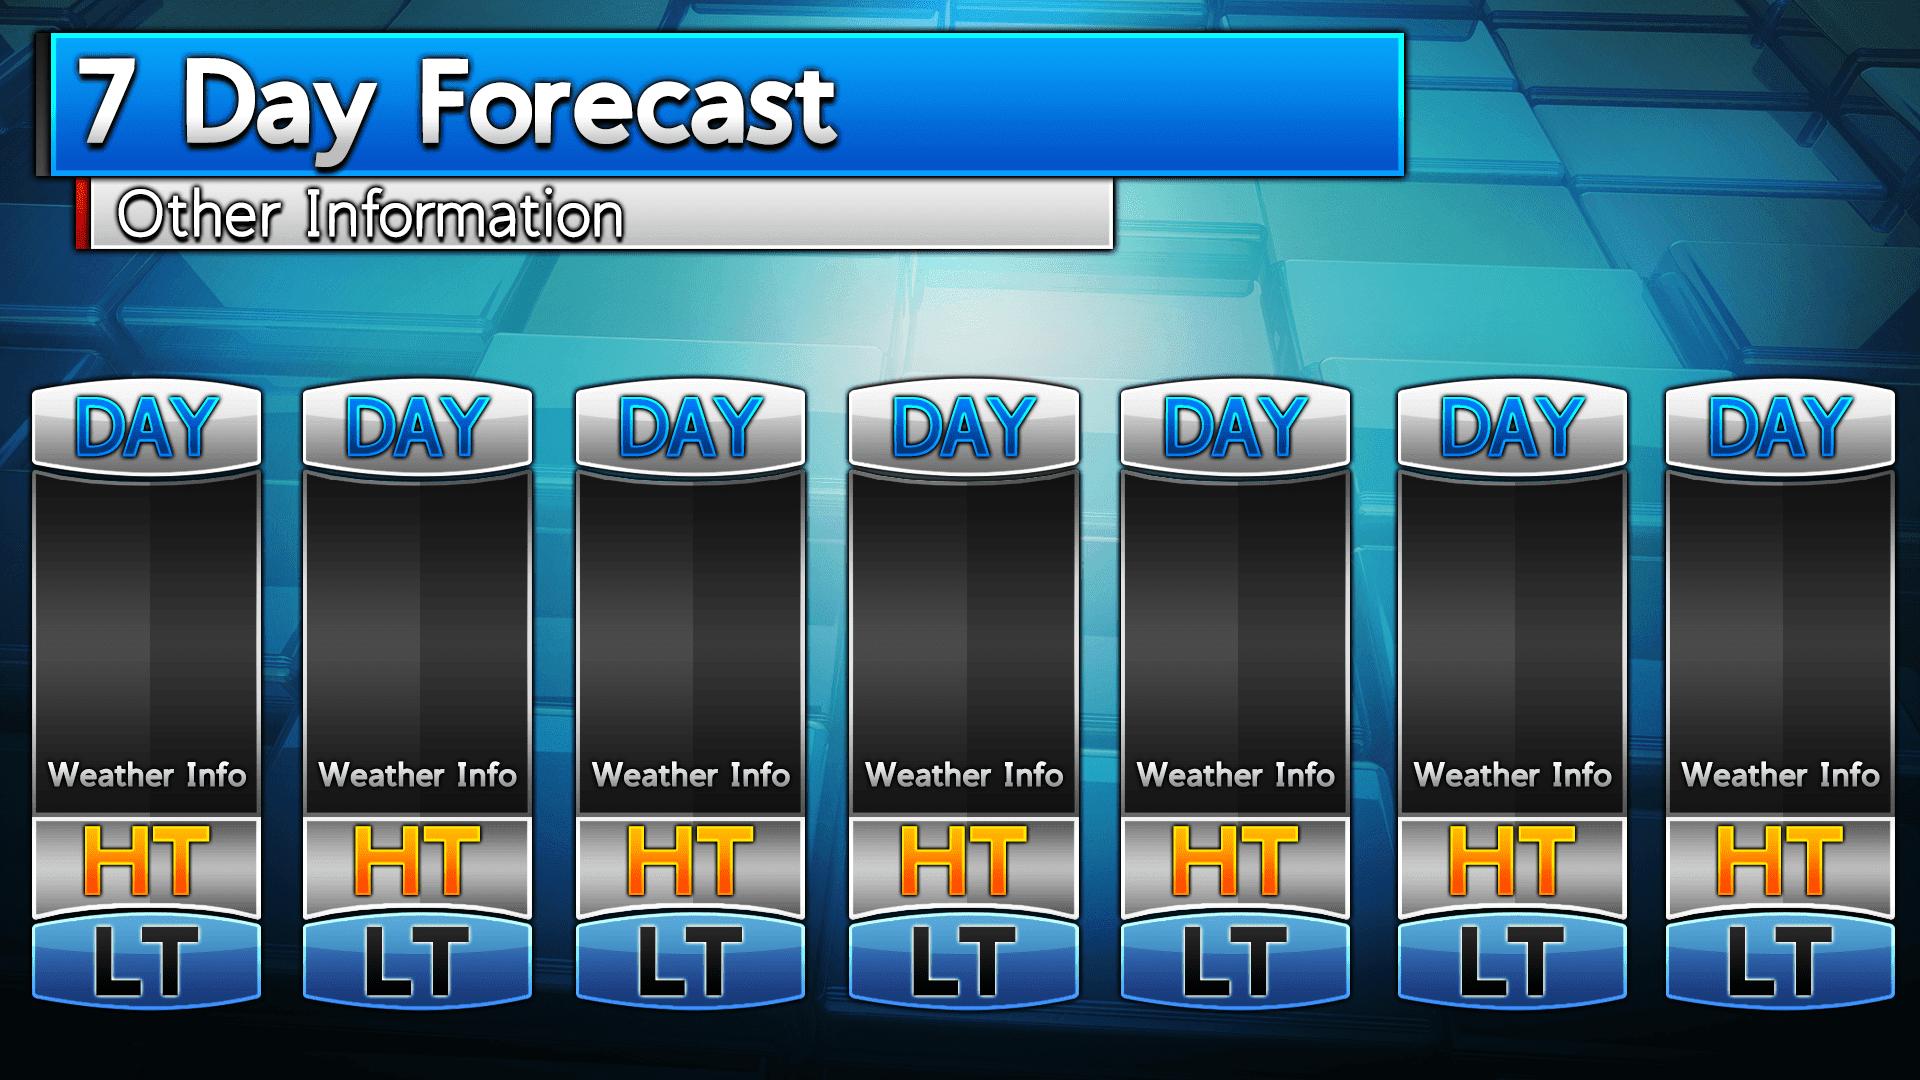 MetGraphics | Weather Graphics, Photoshop Templates, & More ...